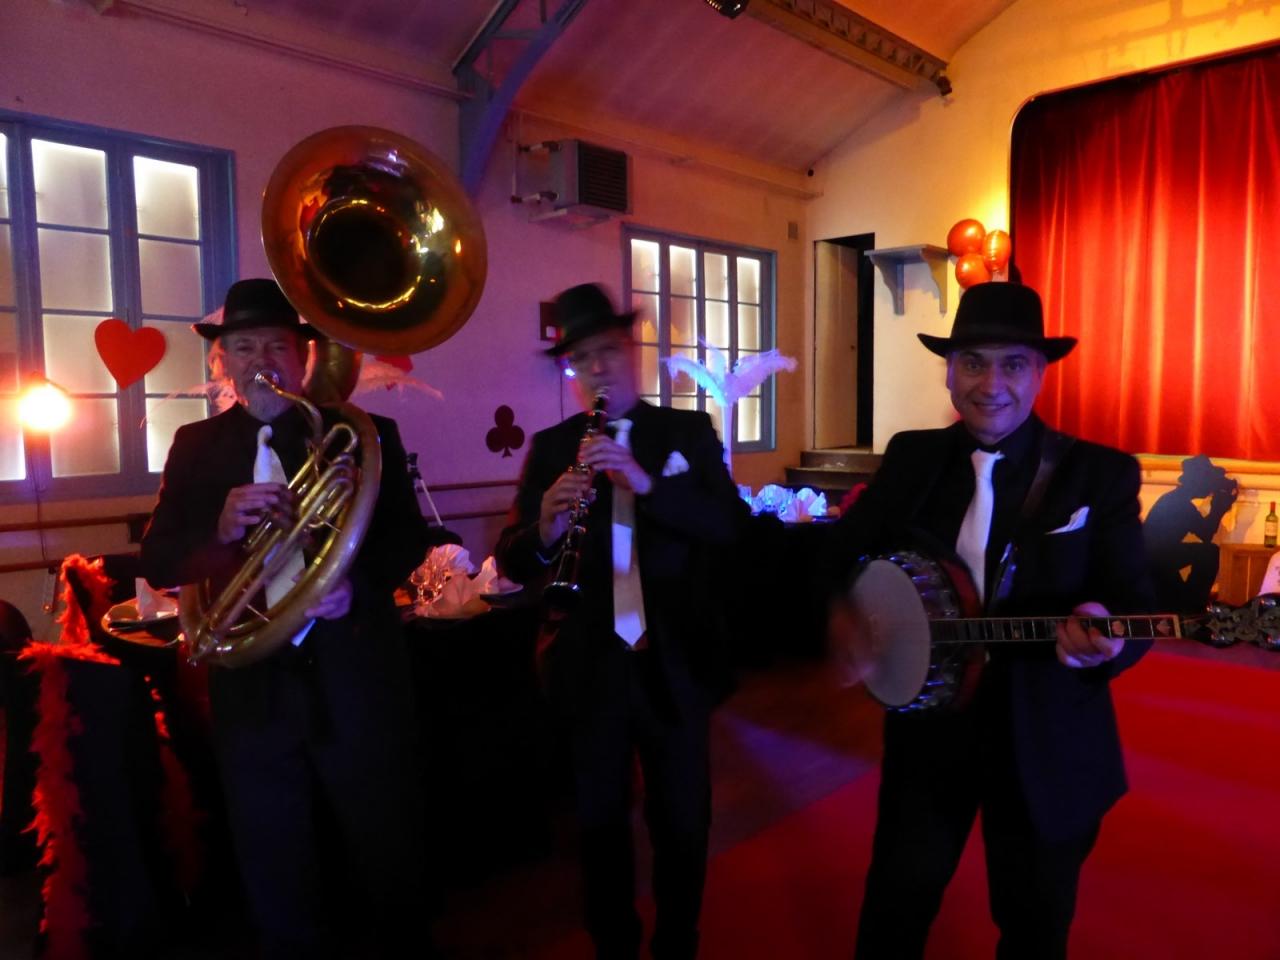 Jazzband Gatsby années 20 en trio